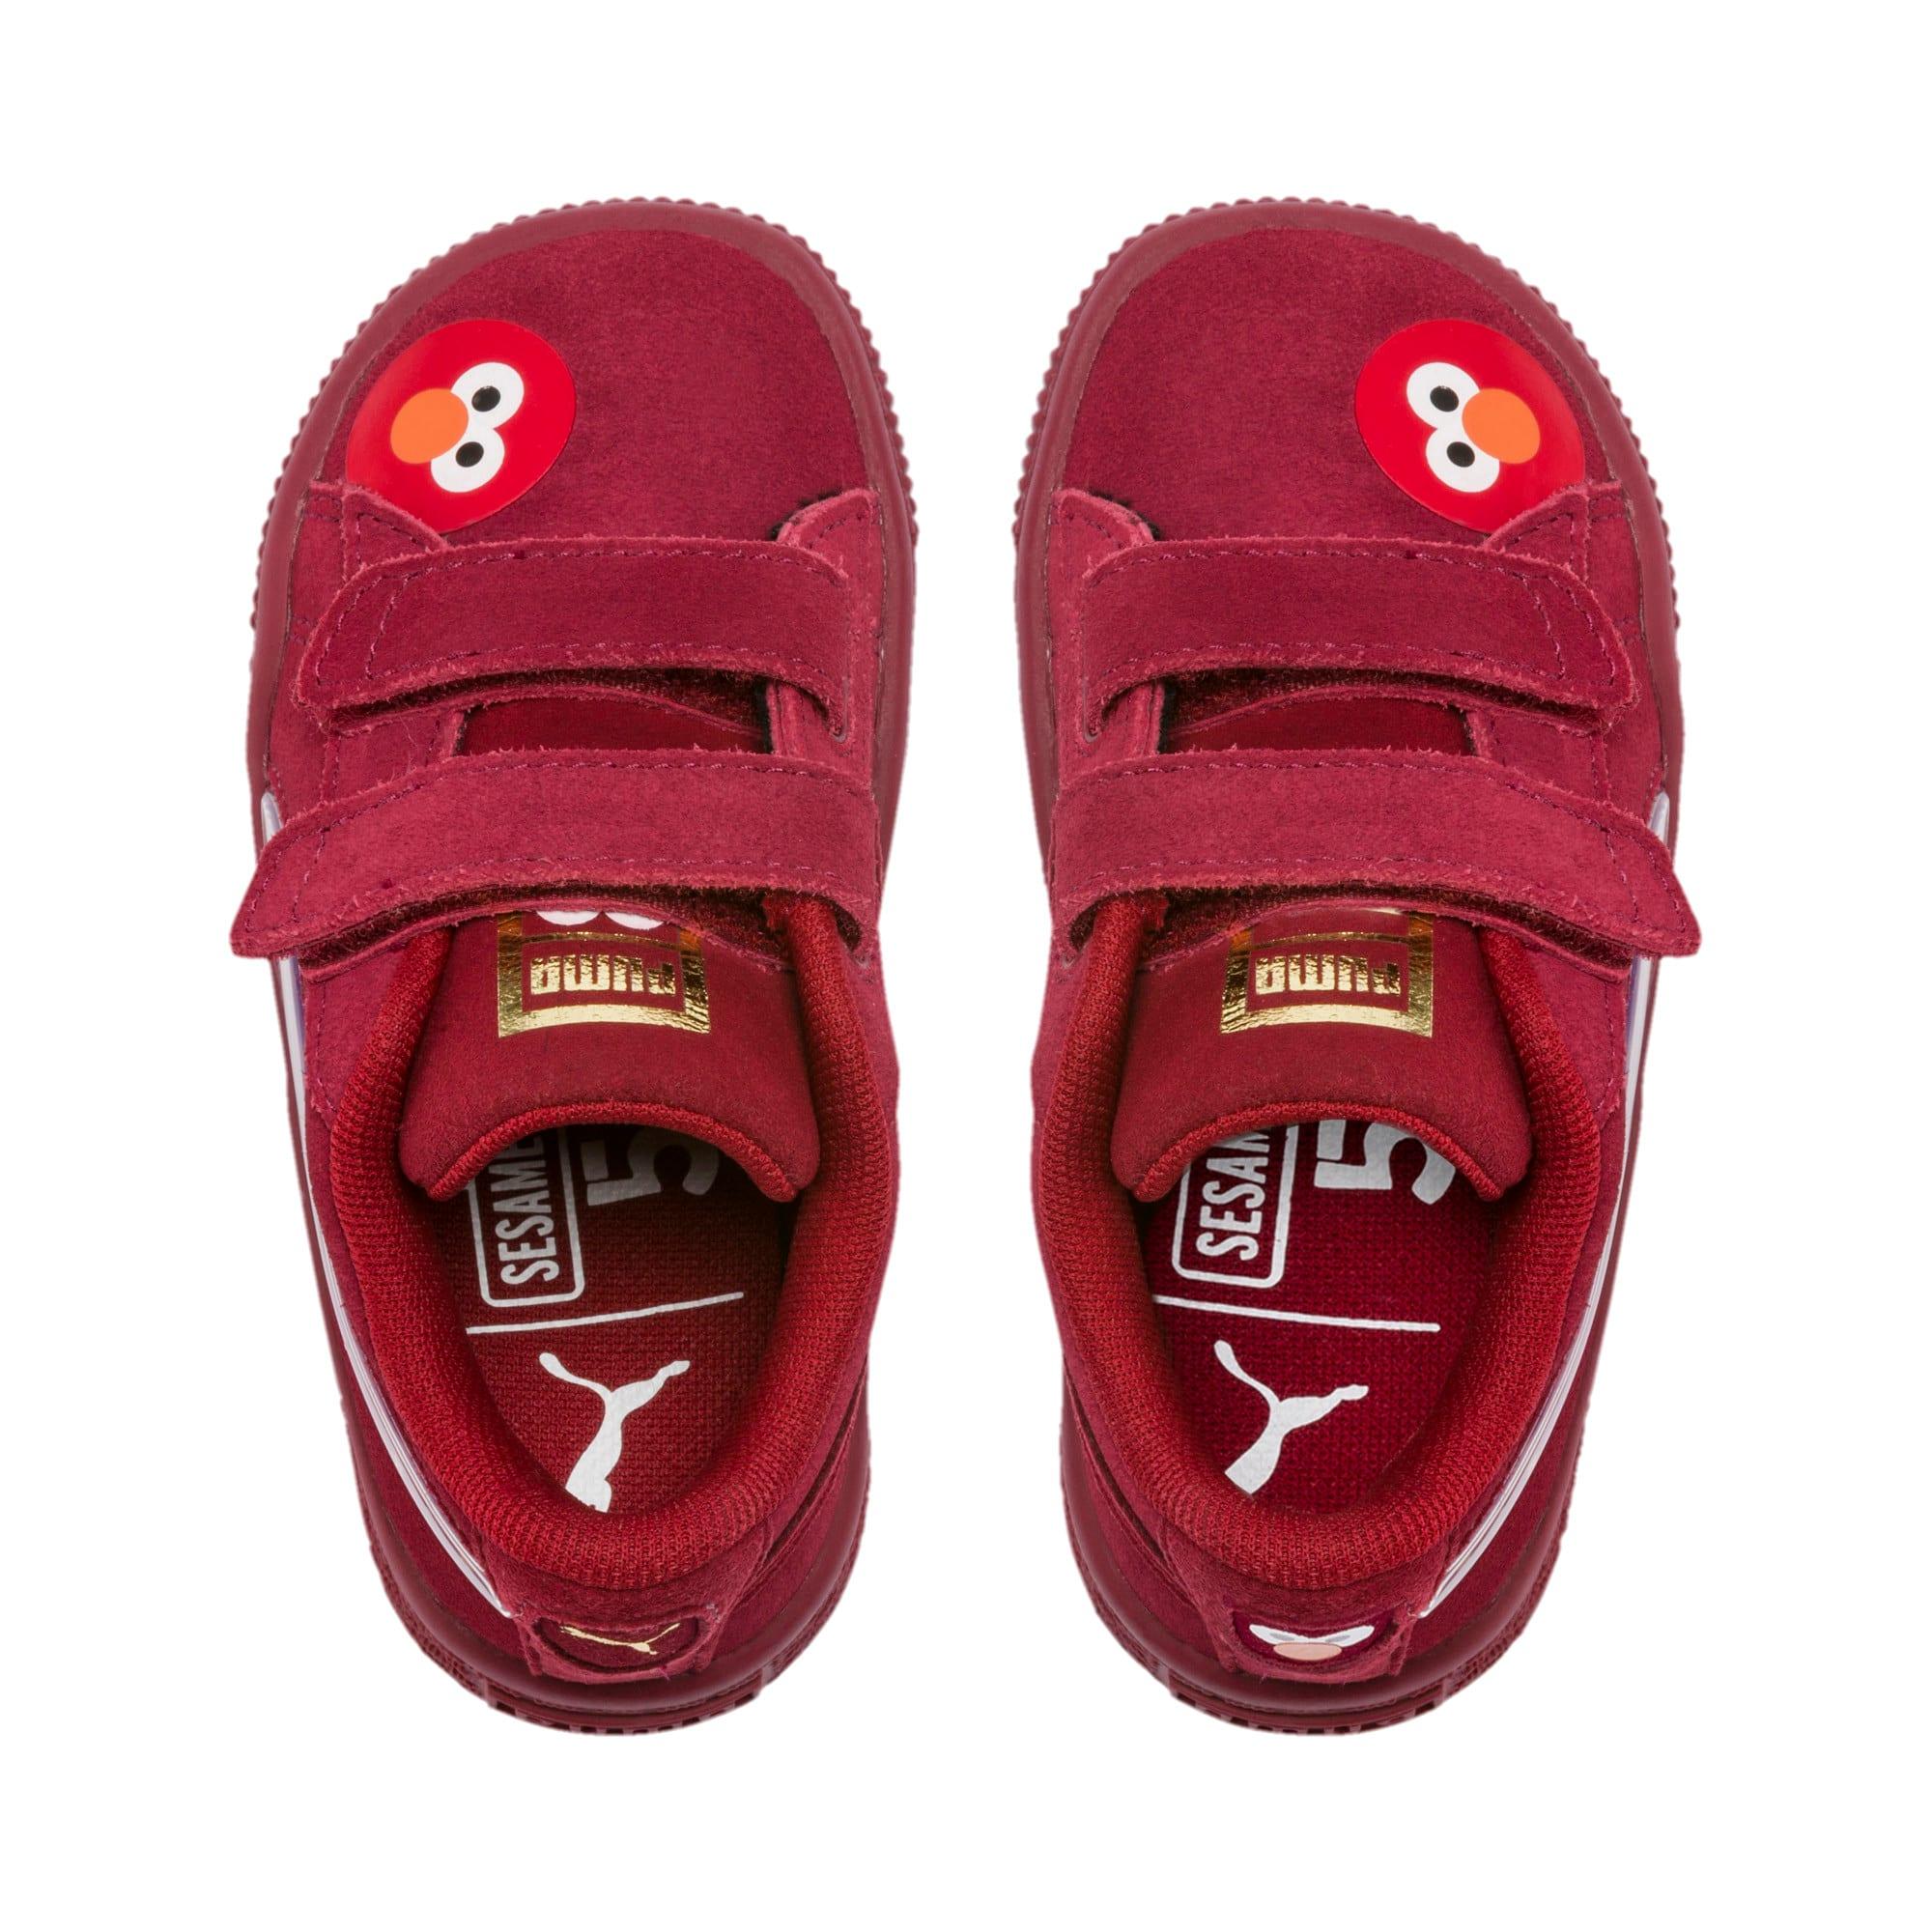 Thumbnail 6 of PUMA x SESAME STREET 50 Suede Statement Toddler Shoes, Rhubarb-Puma White, medium